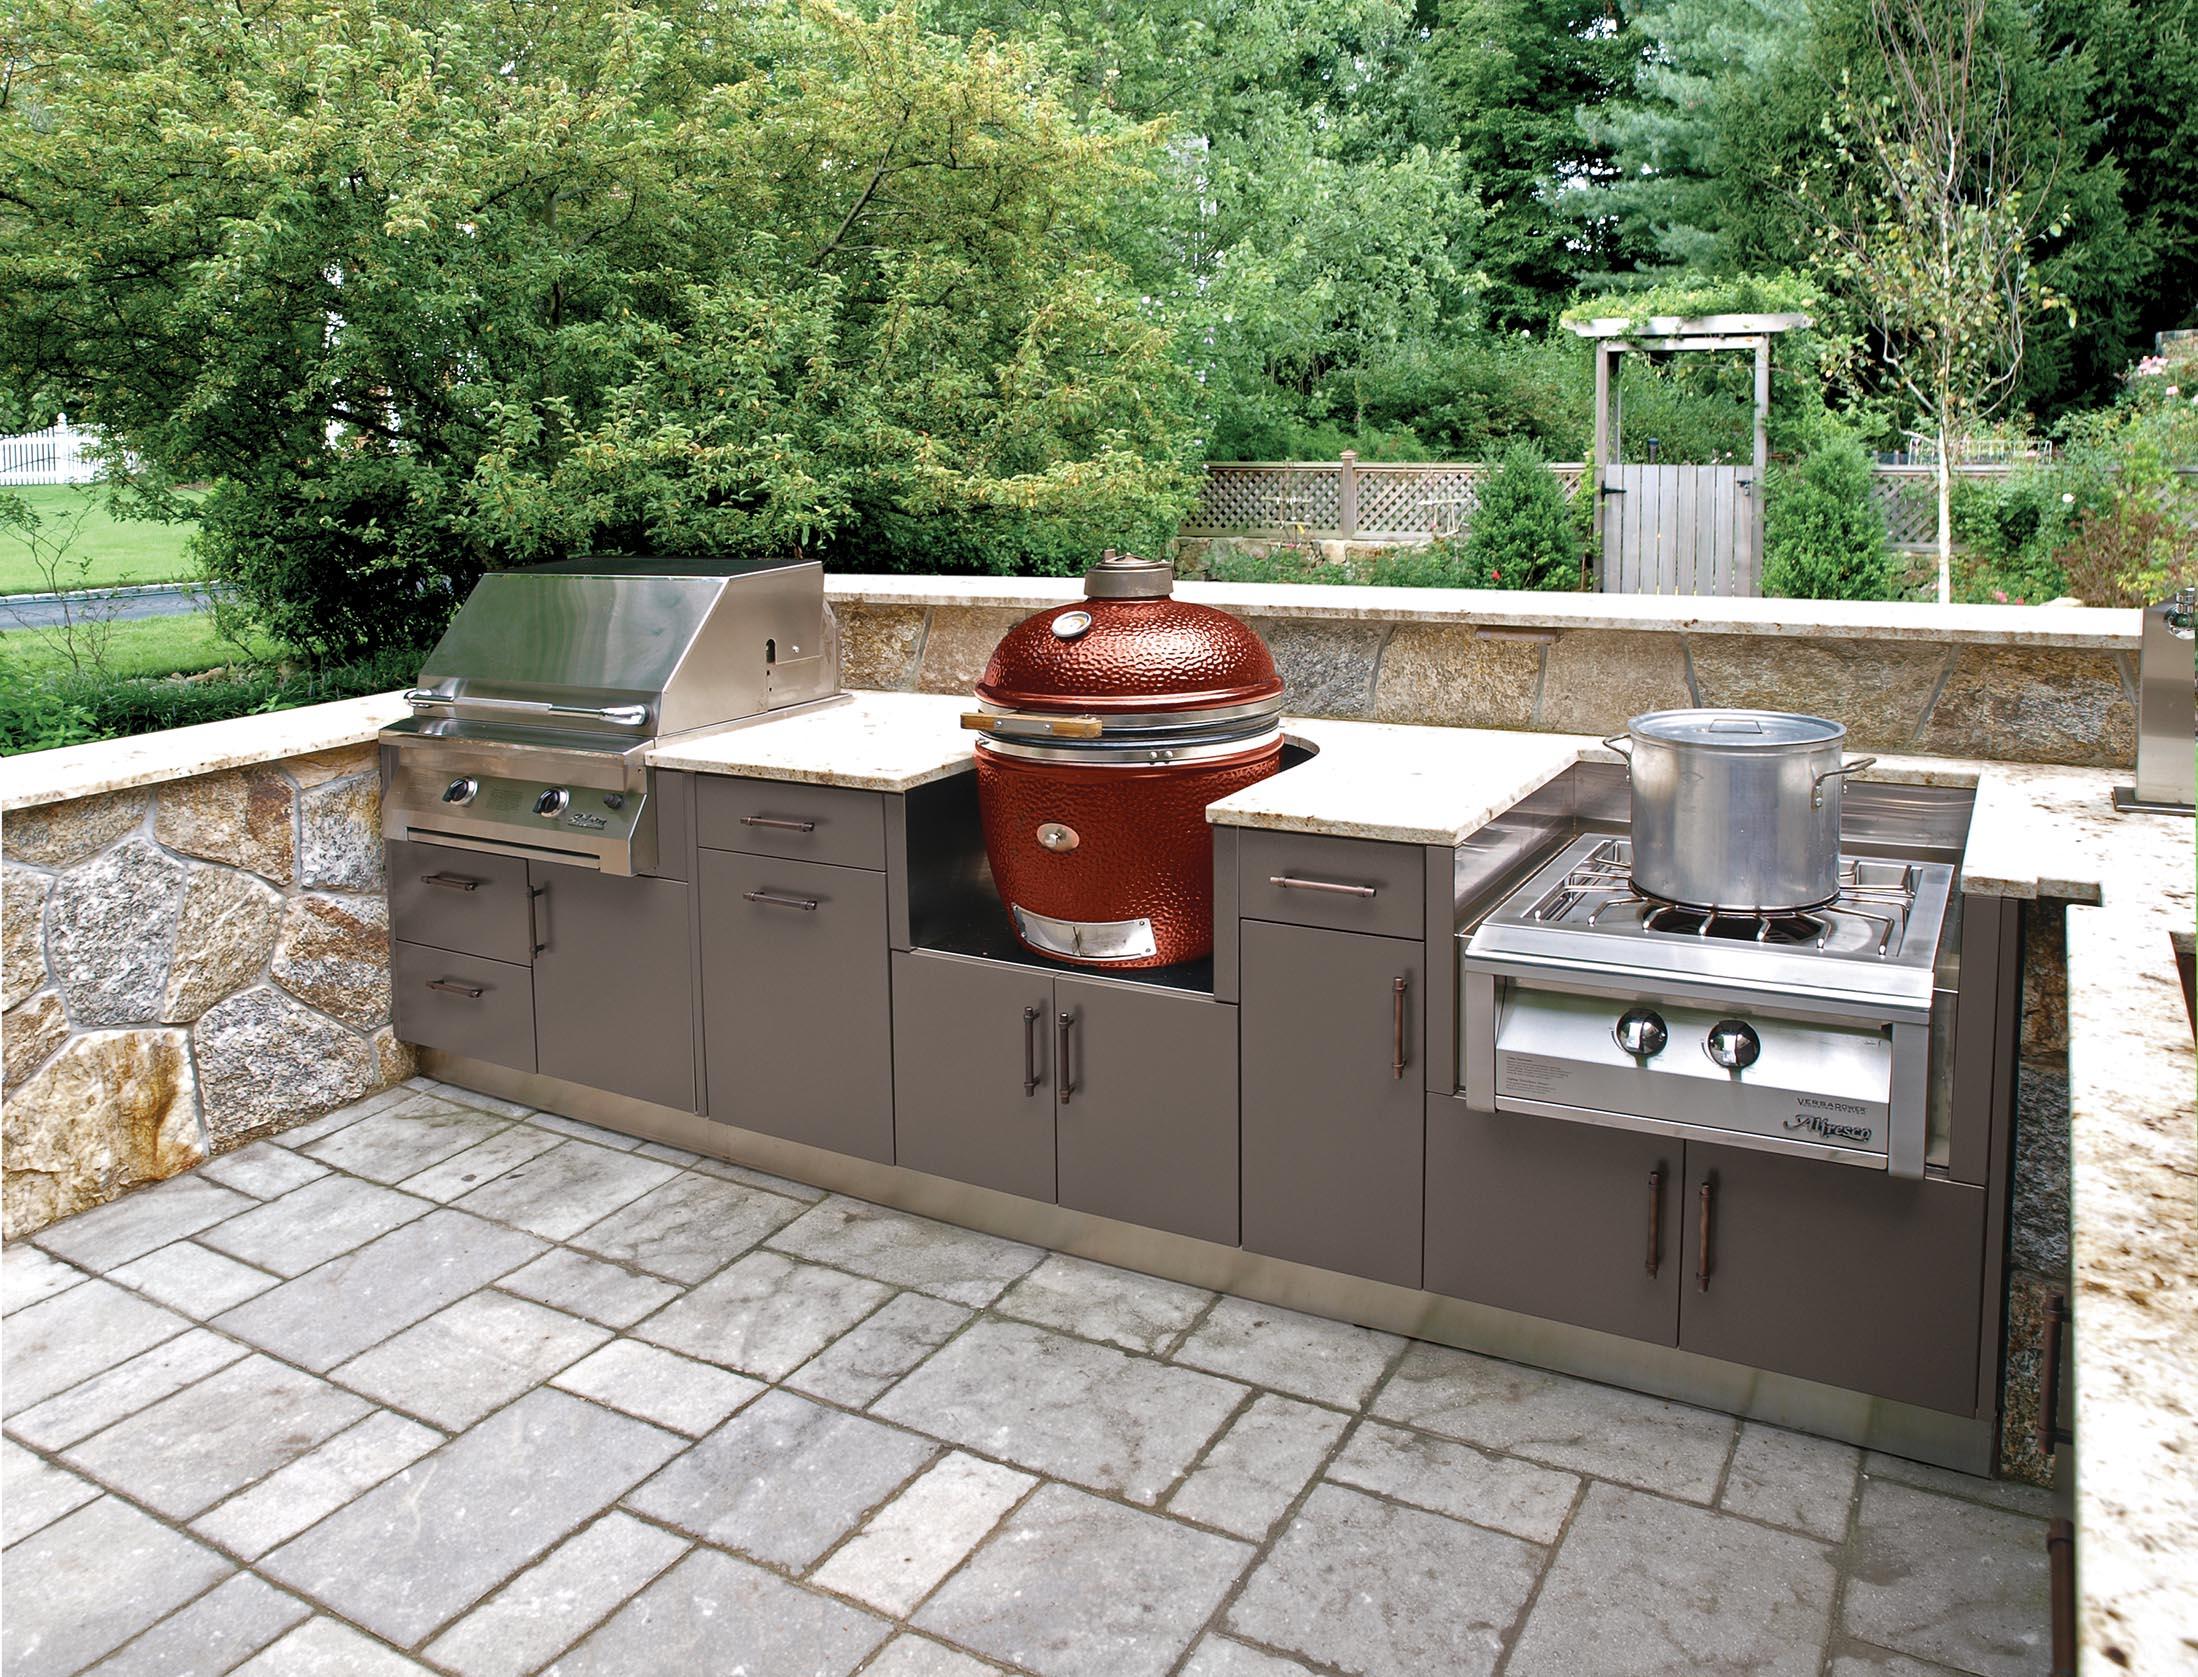 brown jordan outdoor kitchens large kitchen sink ideas for football season